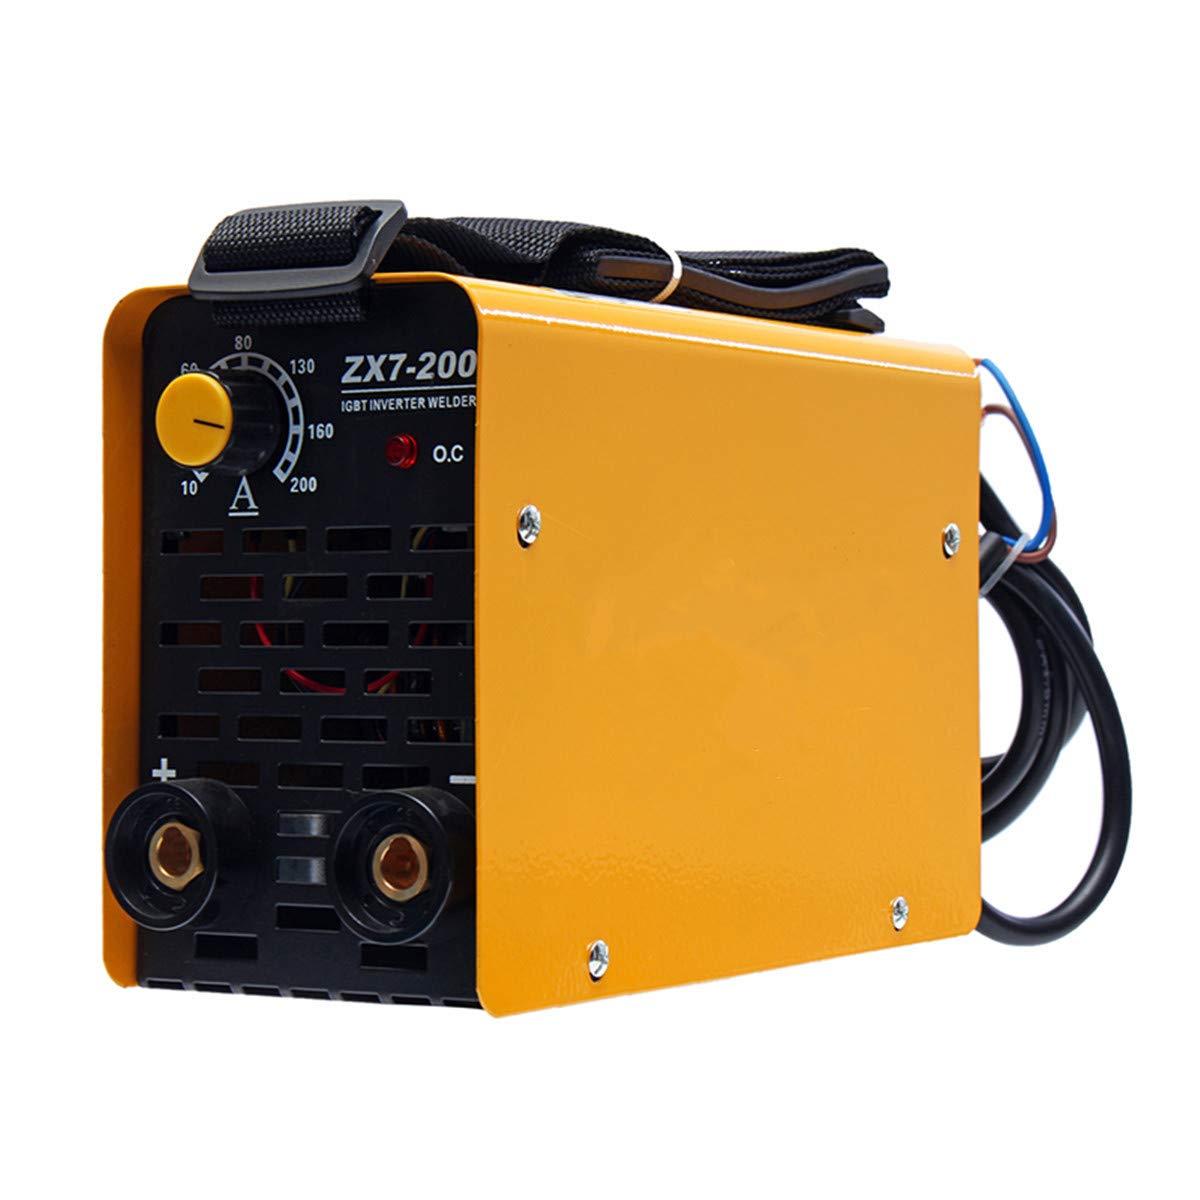 Portable Mini 220V IGBT ZX7-200 Copper MMA Inverter ARC Welding Machine 10-200A